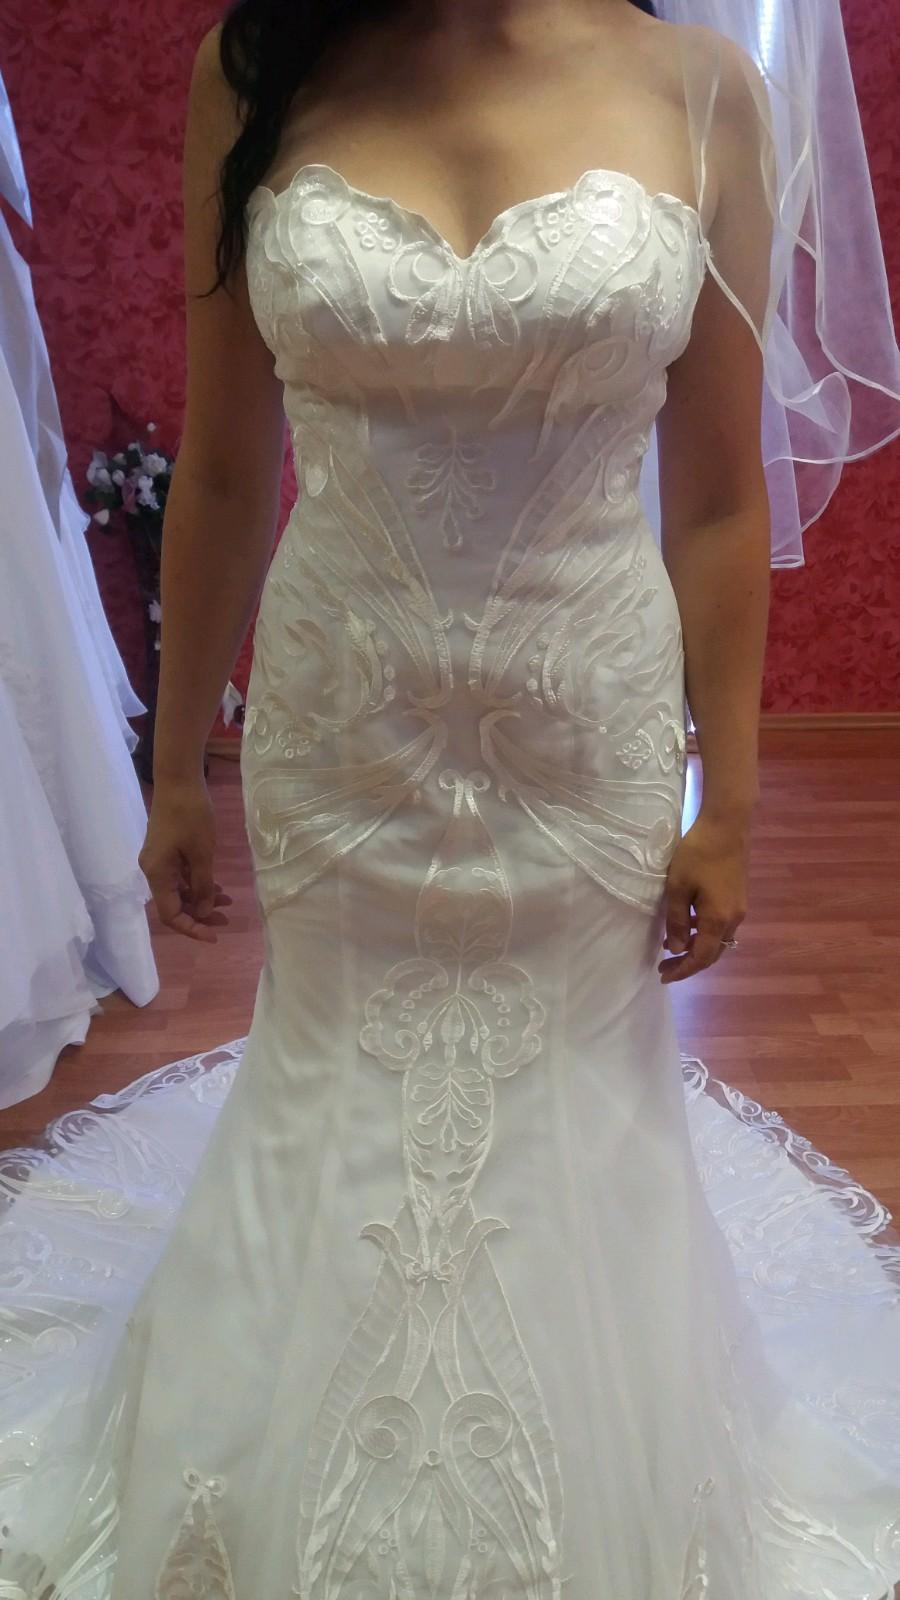 Svadobné šaty s 3d čipkou v ivory farbe - Obrázok č. 1